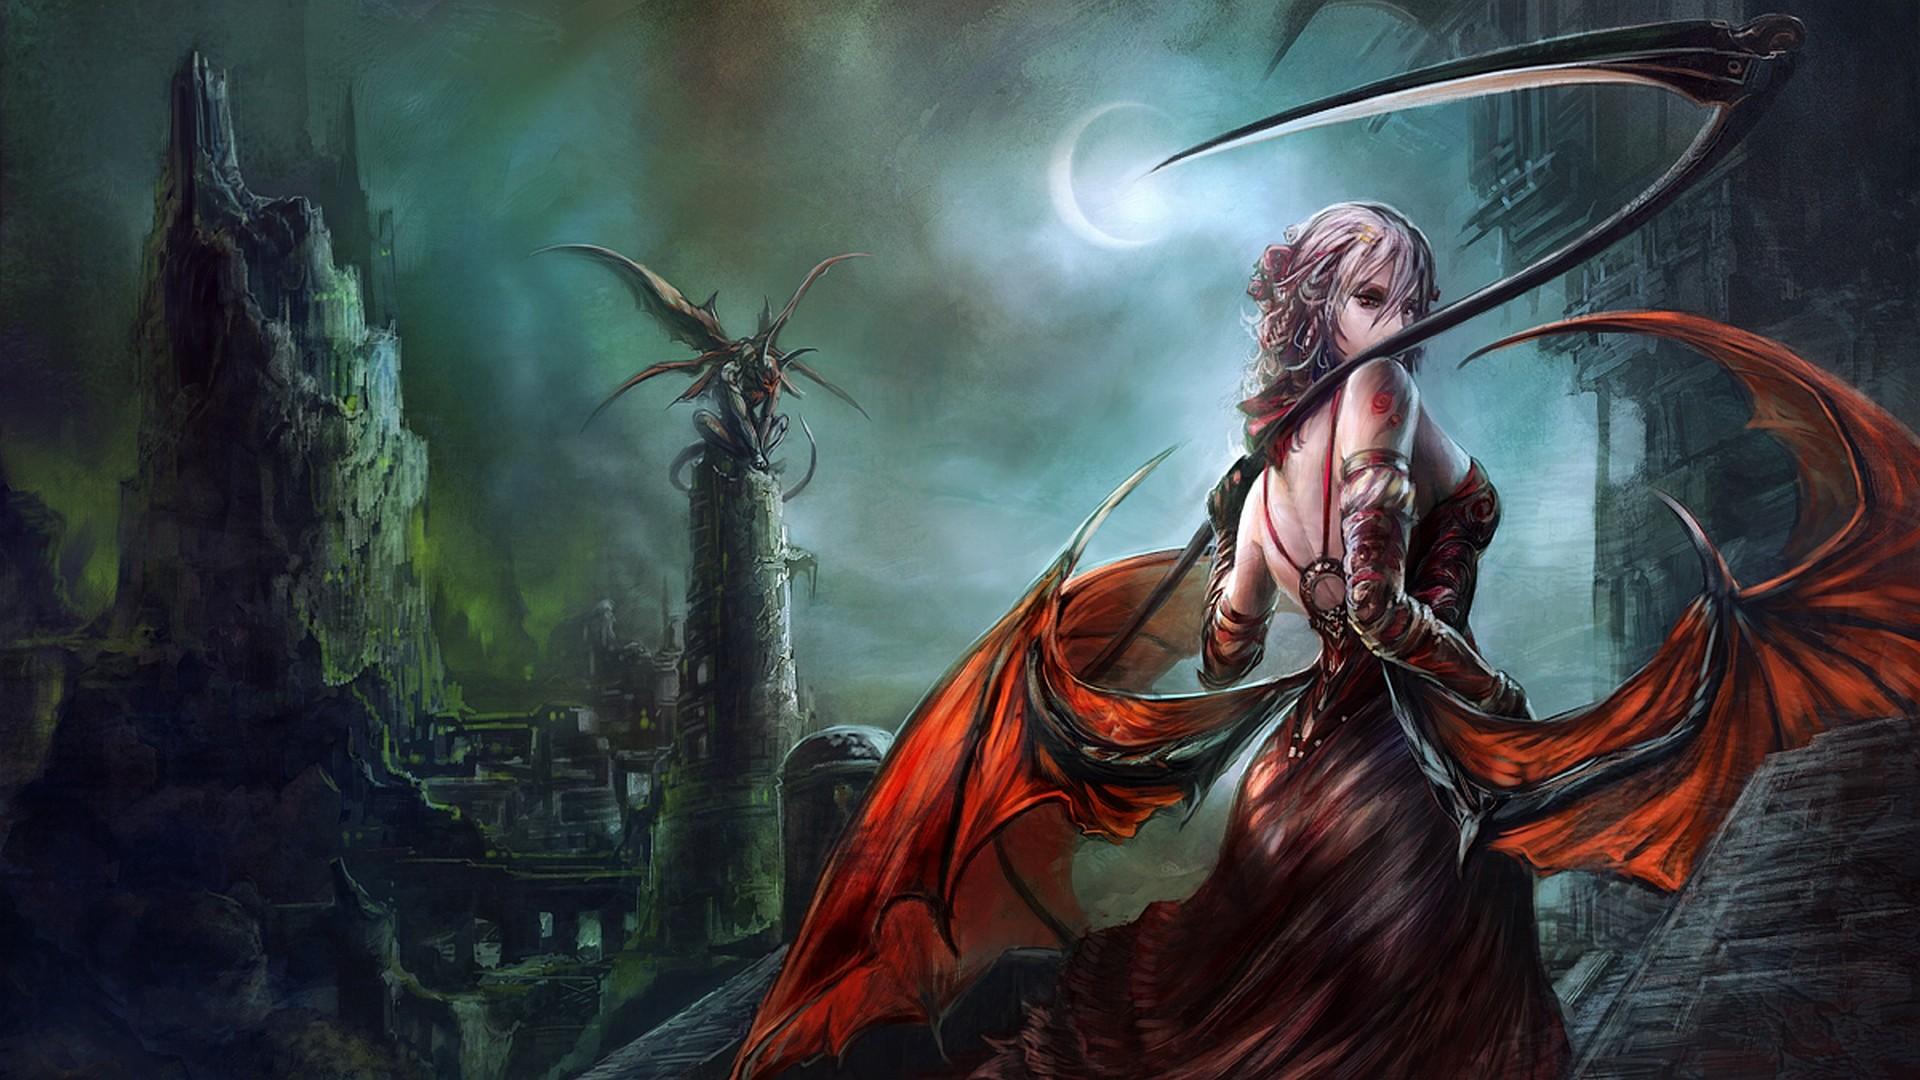 Big Dark Female Warrior Art - Fantasy Art Female Demon - HD Wallpaper